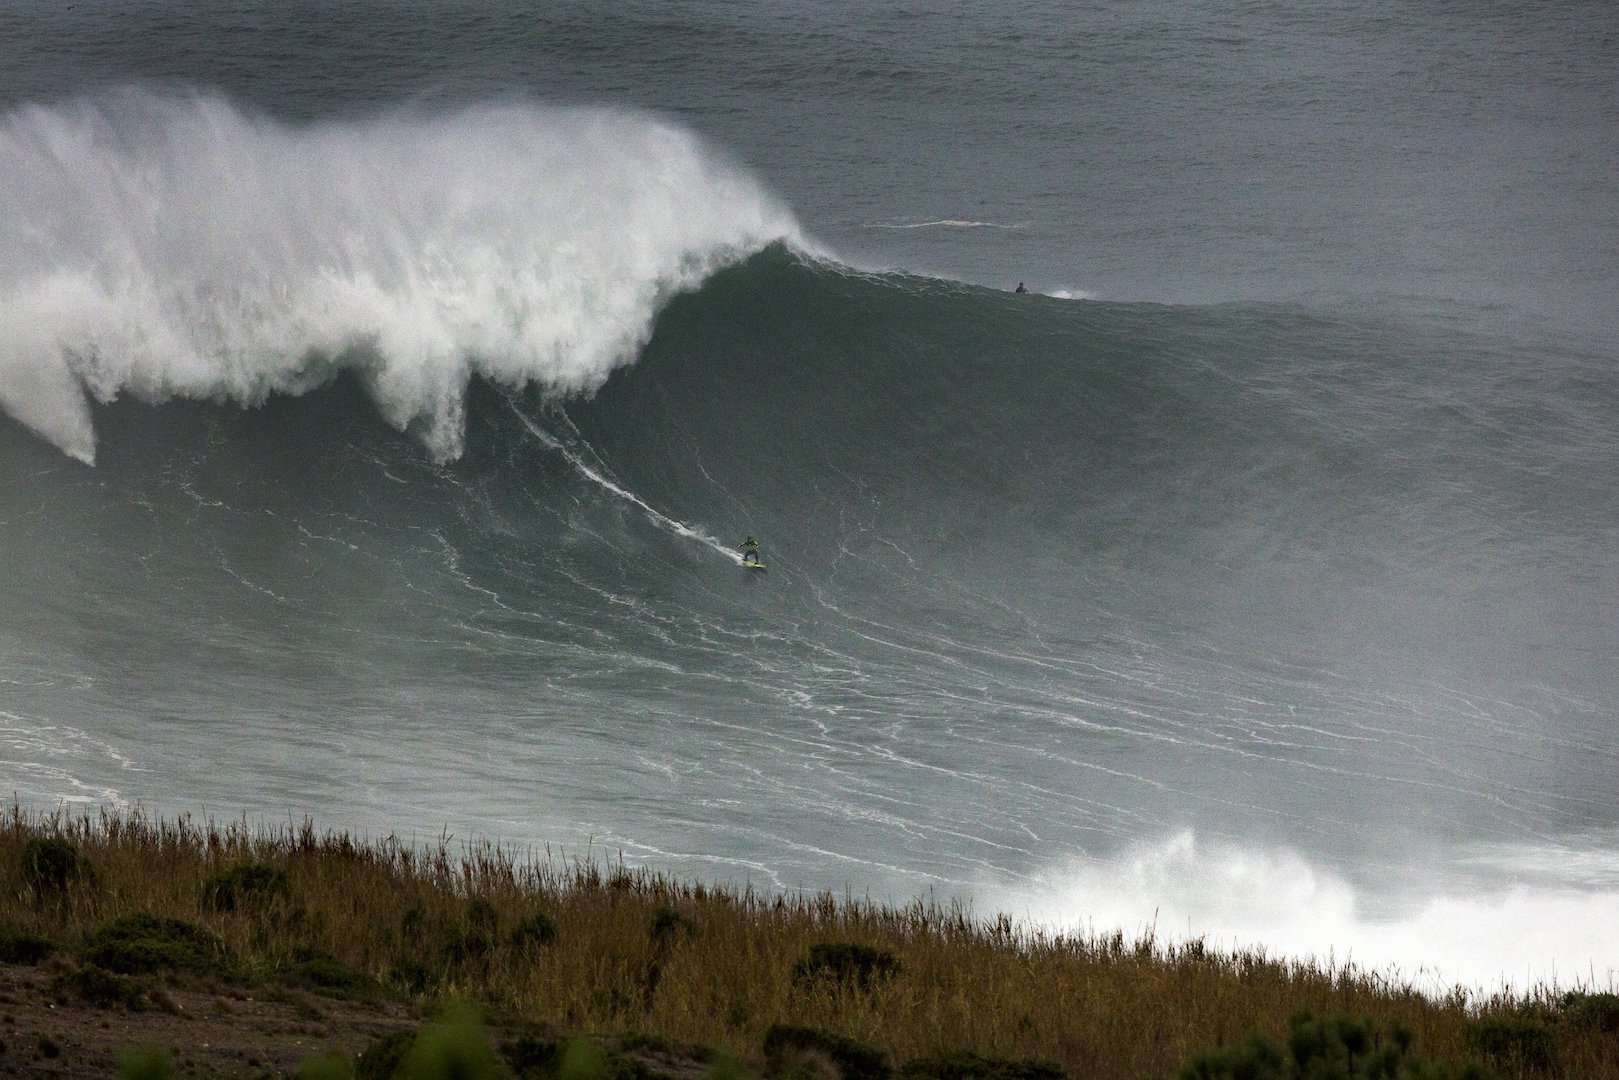 Carlos Burle surfs a big wave at Praia do Norte in Nazare, Portugal on November 01, 2015 // Hugo Silva/Red Bull Content Pool